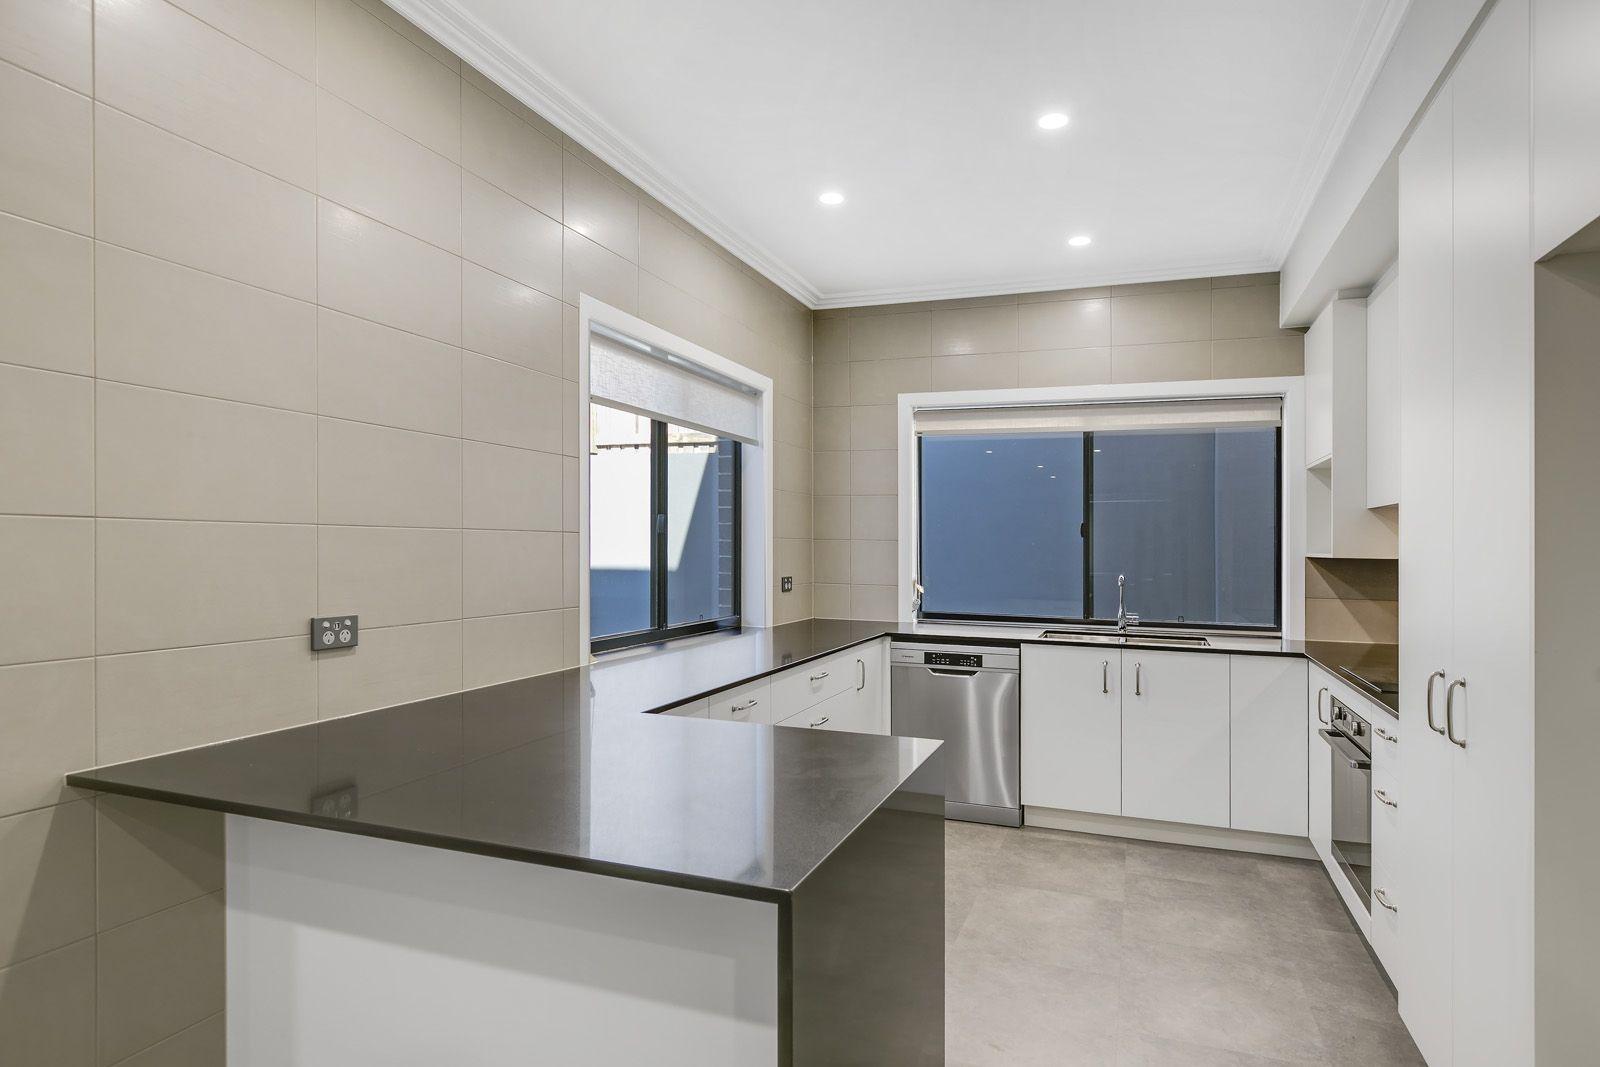 2/13 Image Flat Rd, Nambour QLD 4560, Image 1